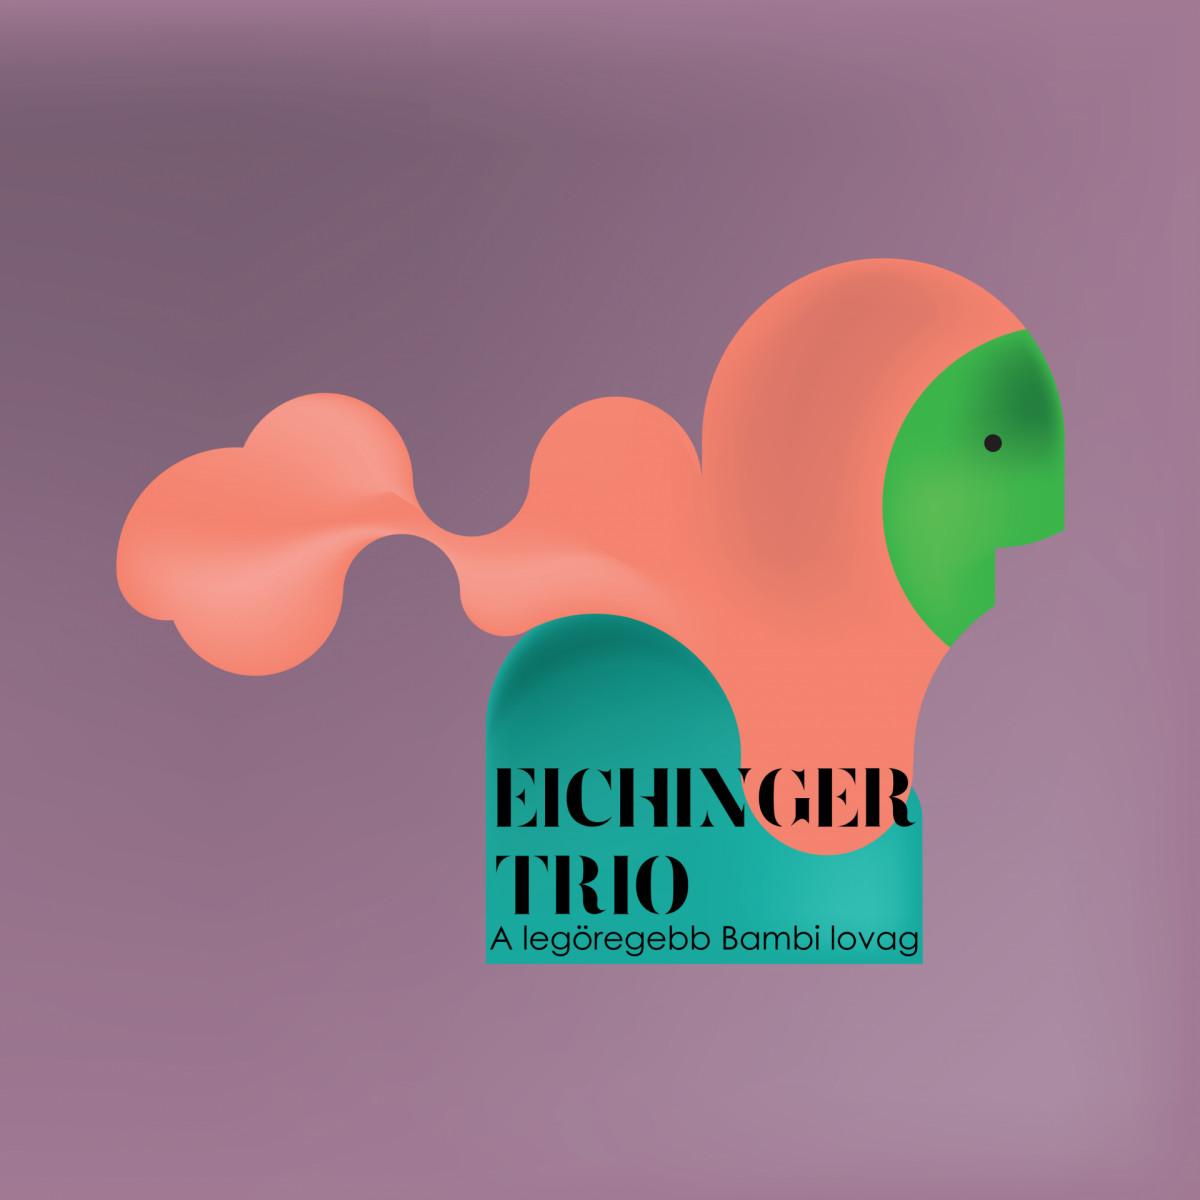 Eichinger Trio: The Oldest Bambi Knight 【予約受付中】